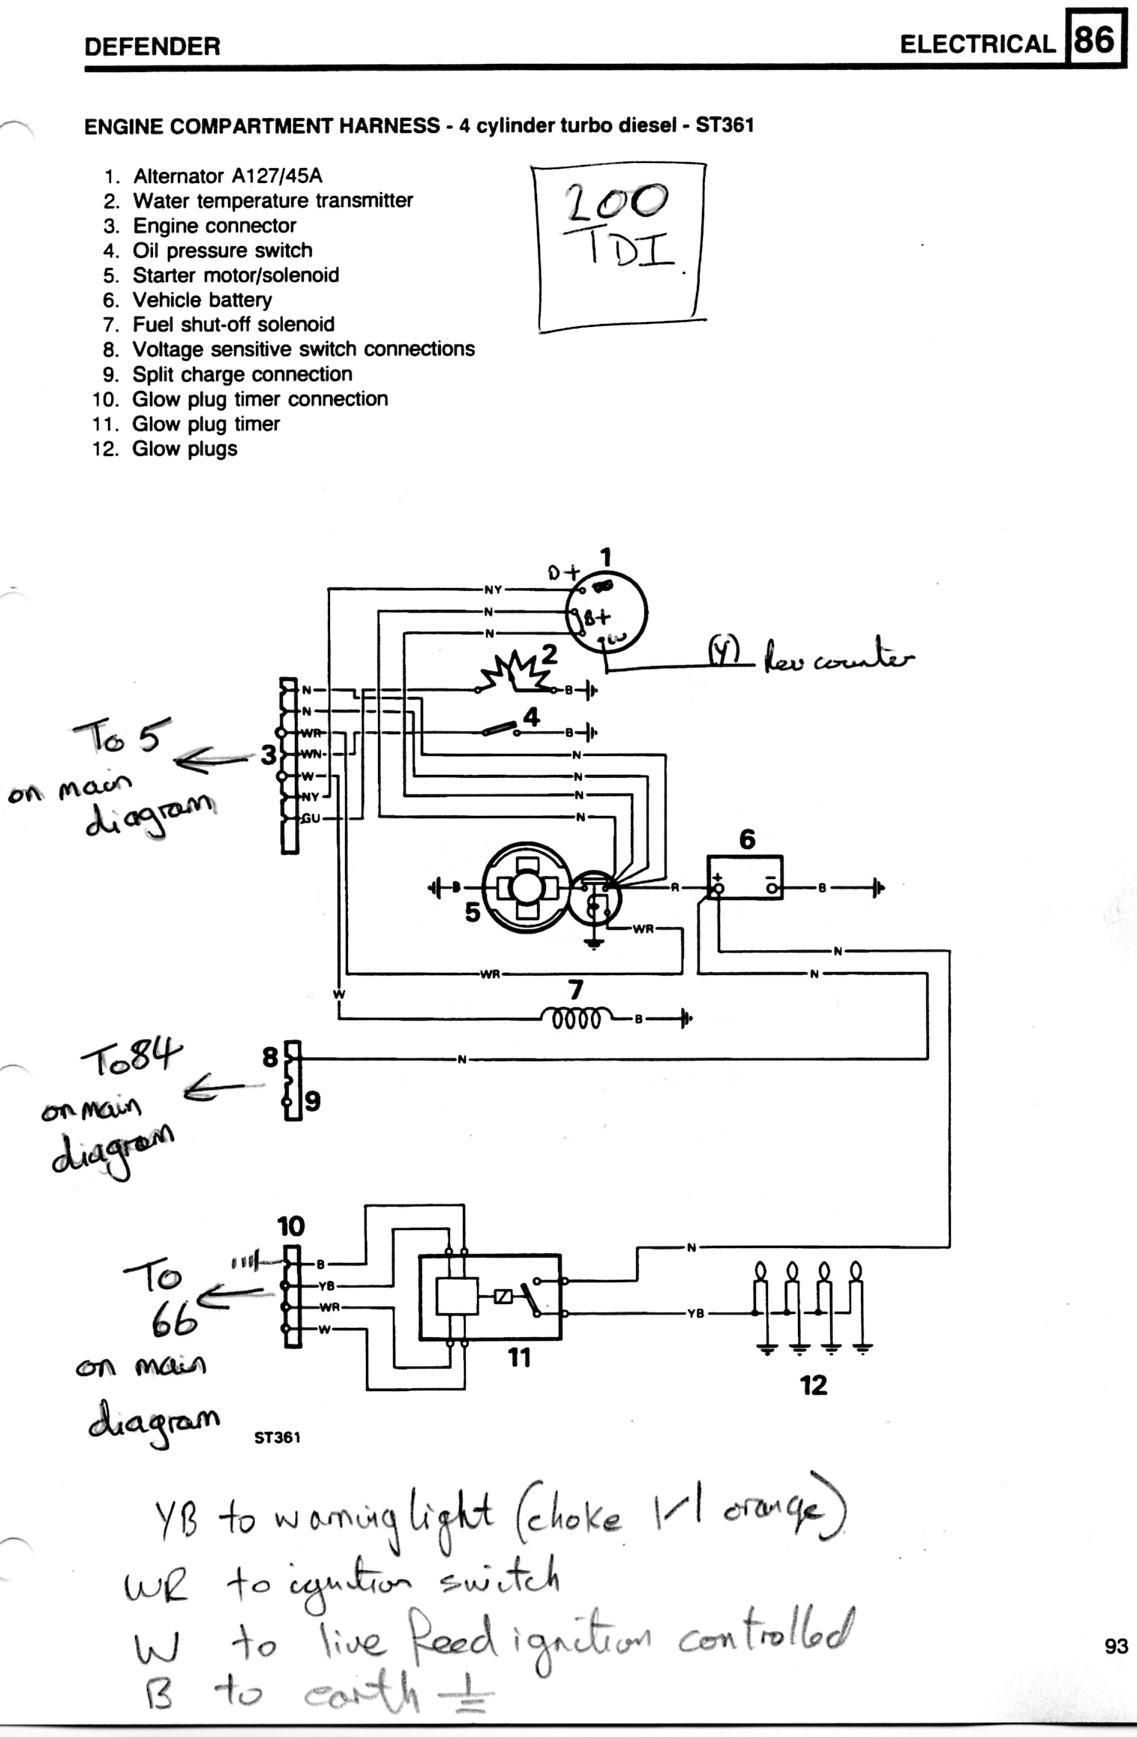 land rover discovery 4 trailer plug wiring diagram on q rj45 2 v8 efi international forum lr4x4 the